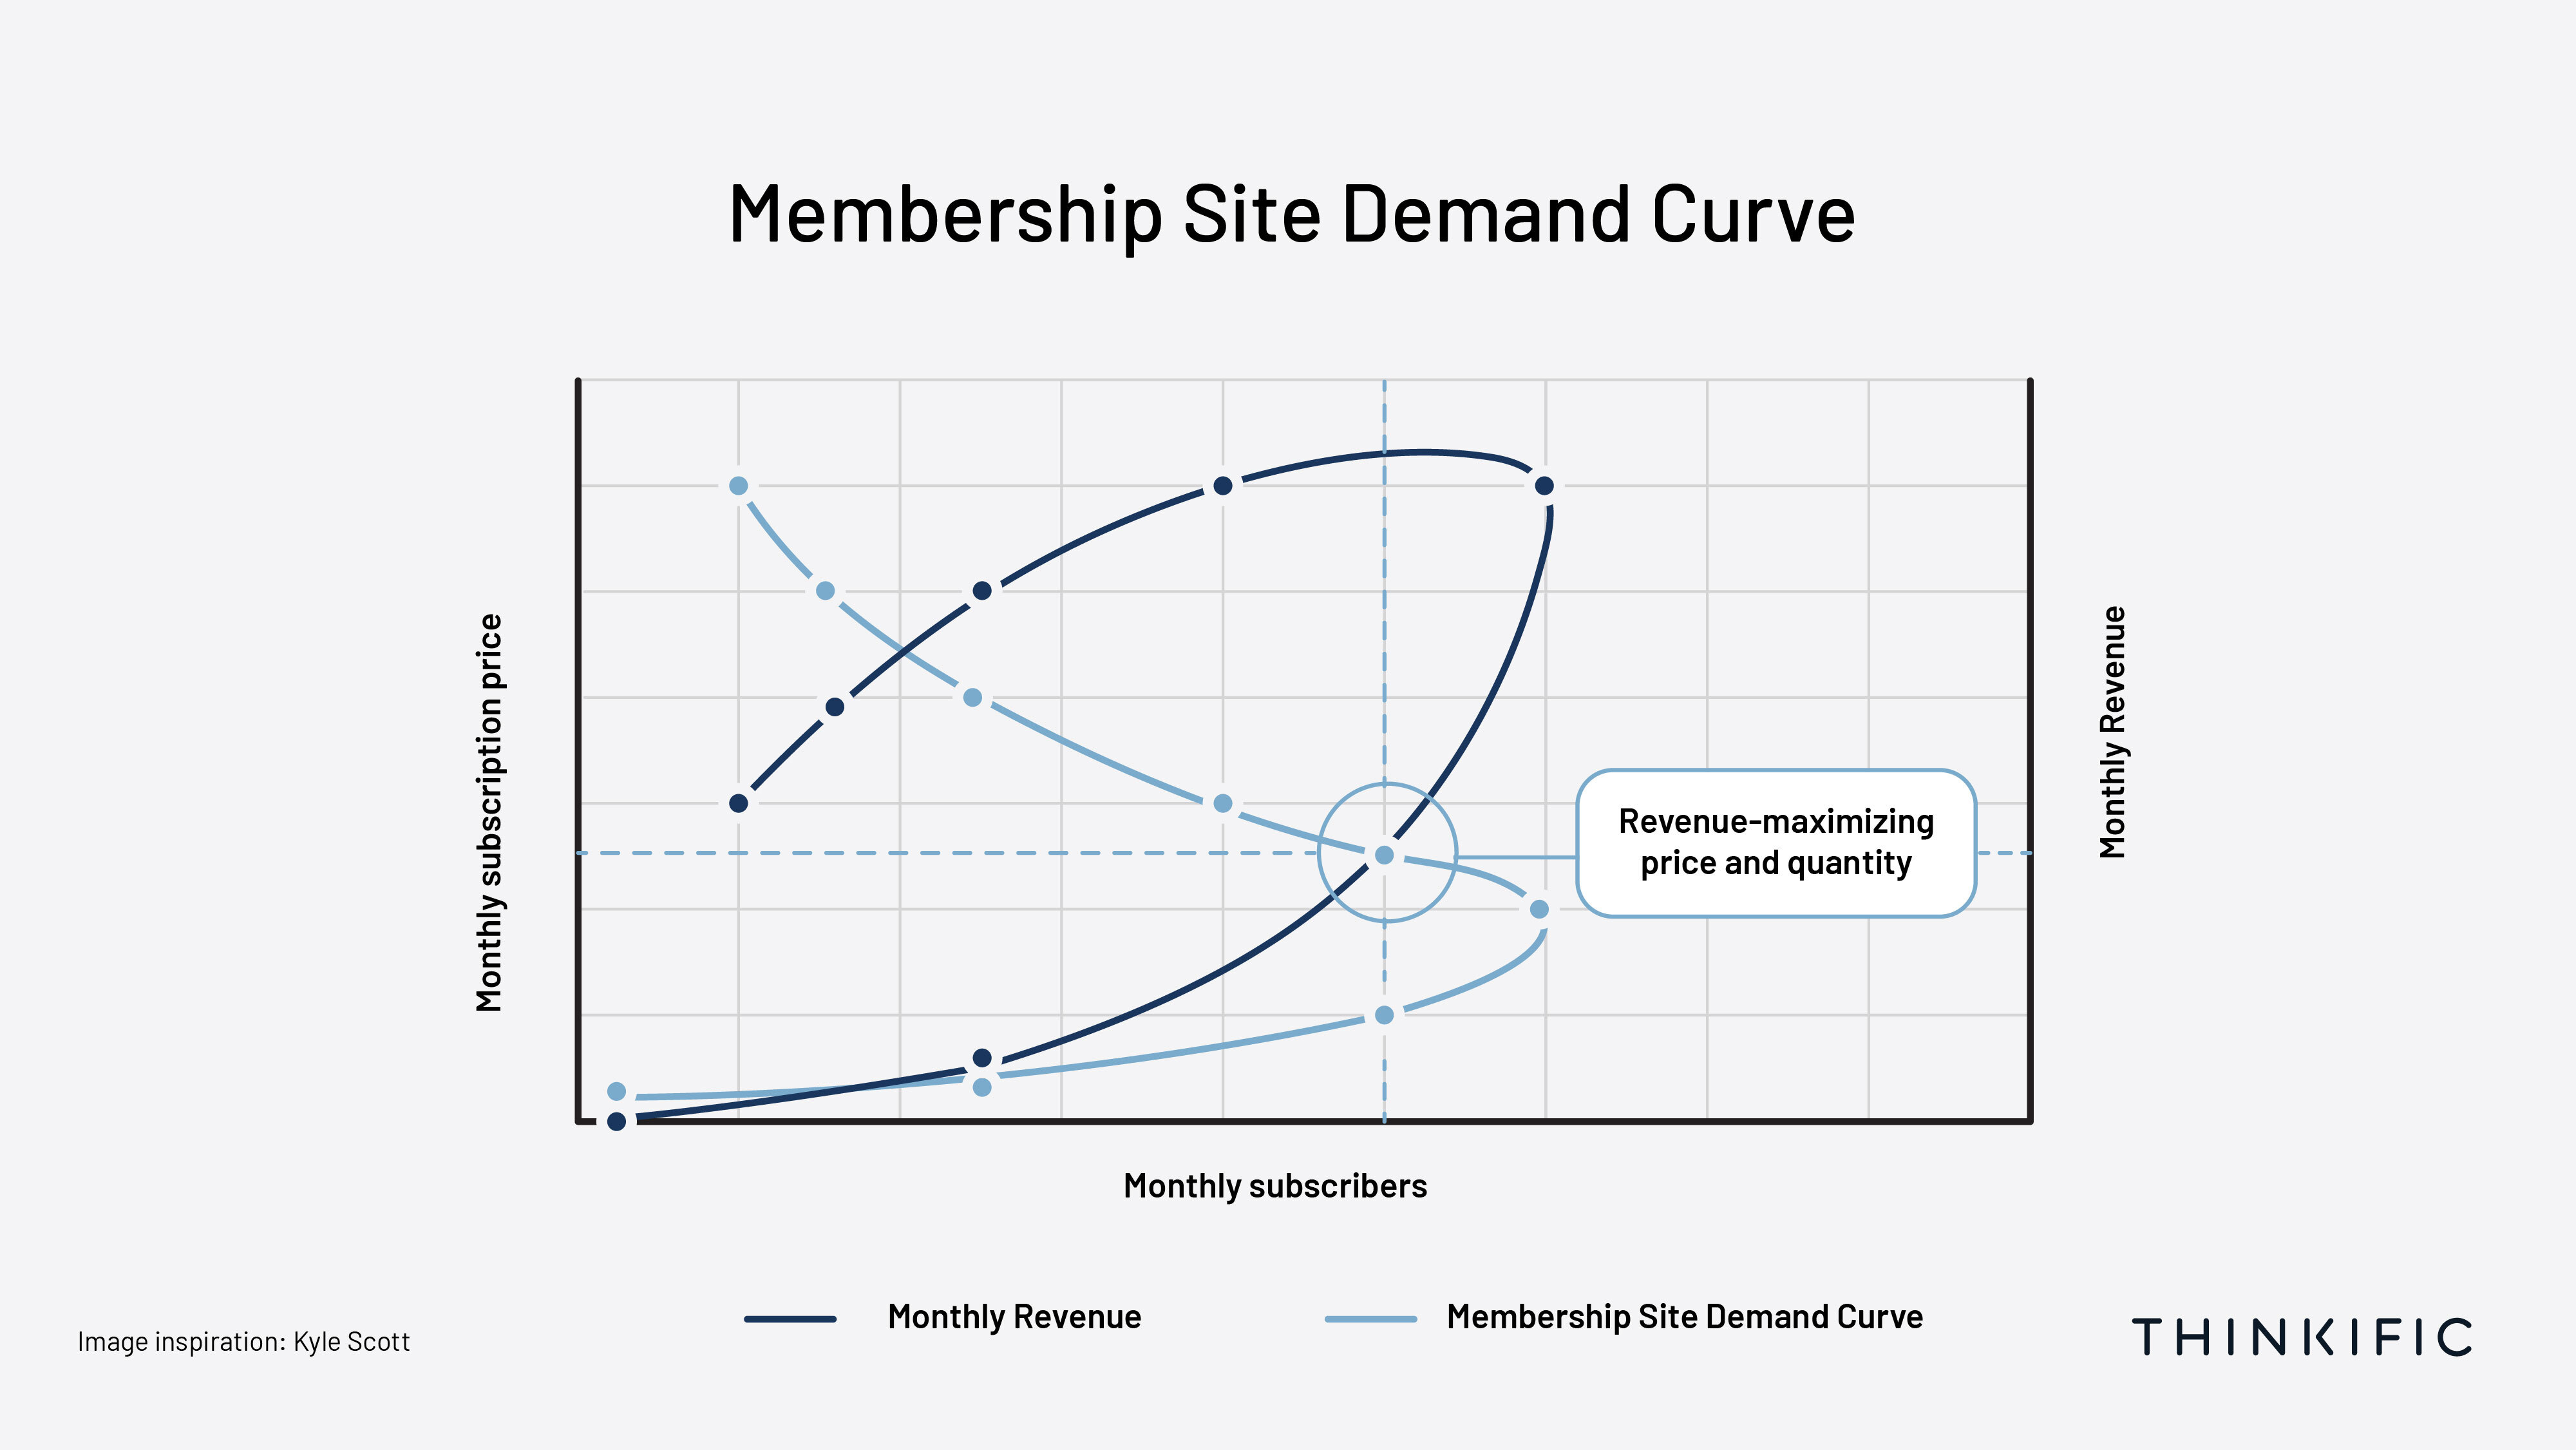 visual representation of the revenue-maximizing price using the above demand curve